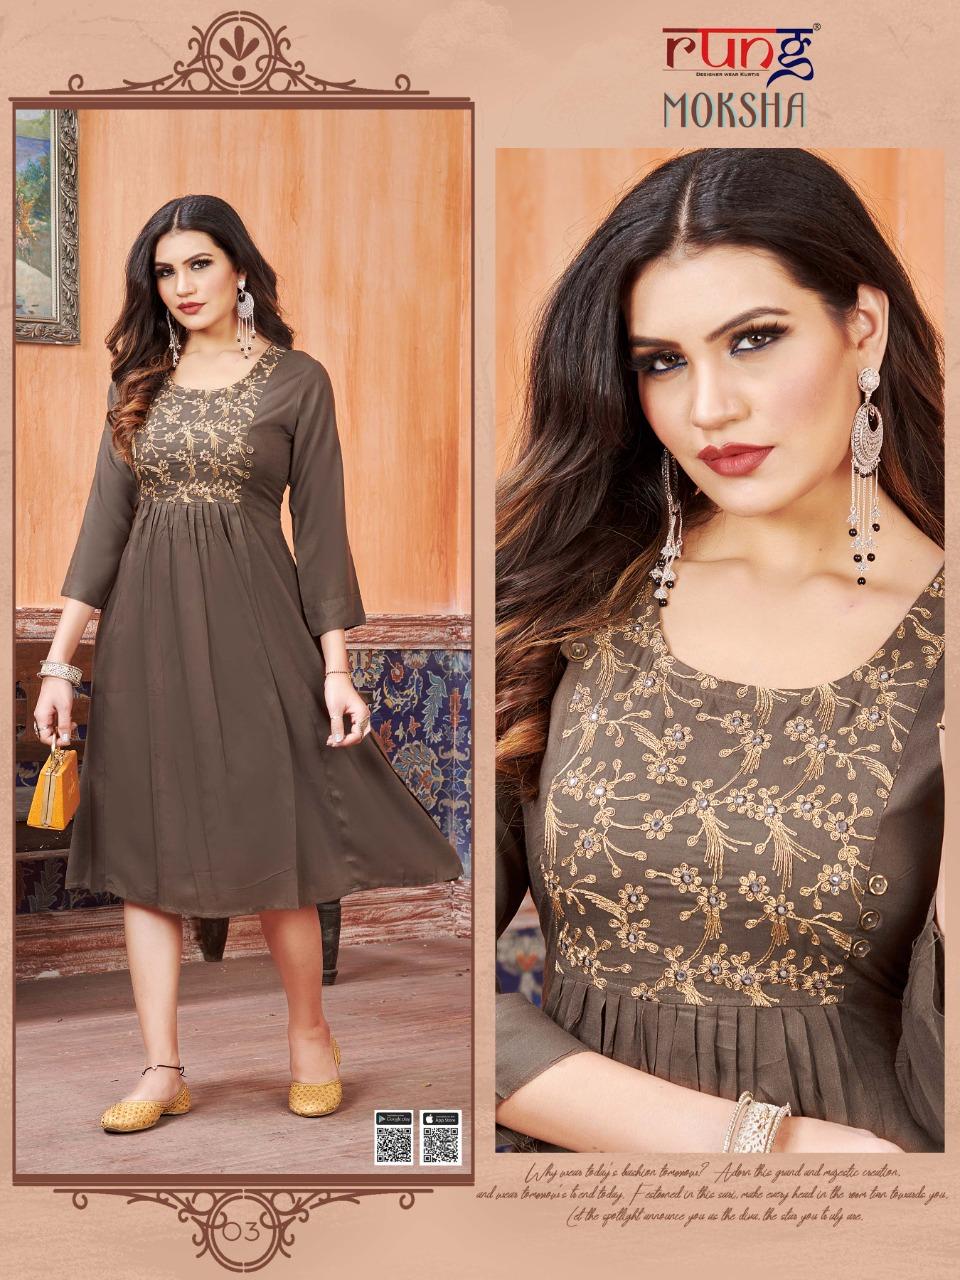 Rung Moksha Heavy Embroidery Rayon Festive Wear kurtis At Wholesale Rate